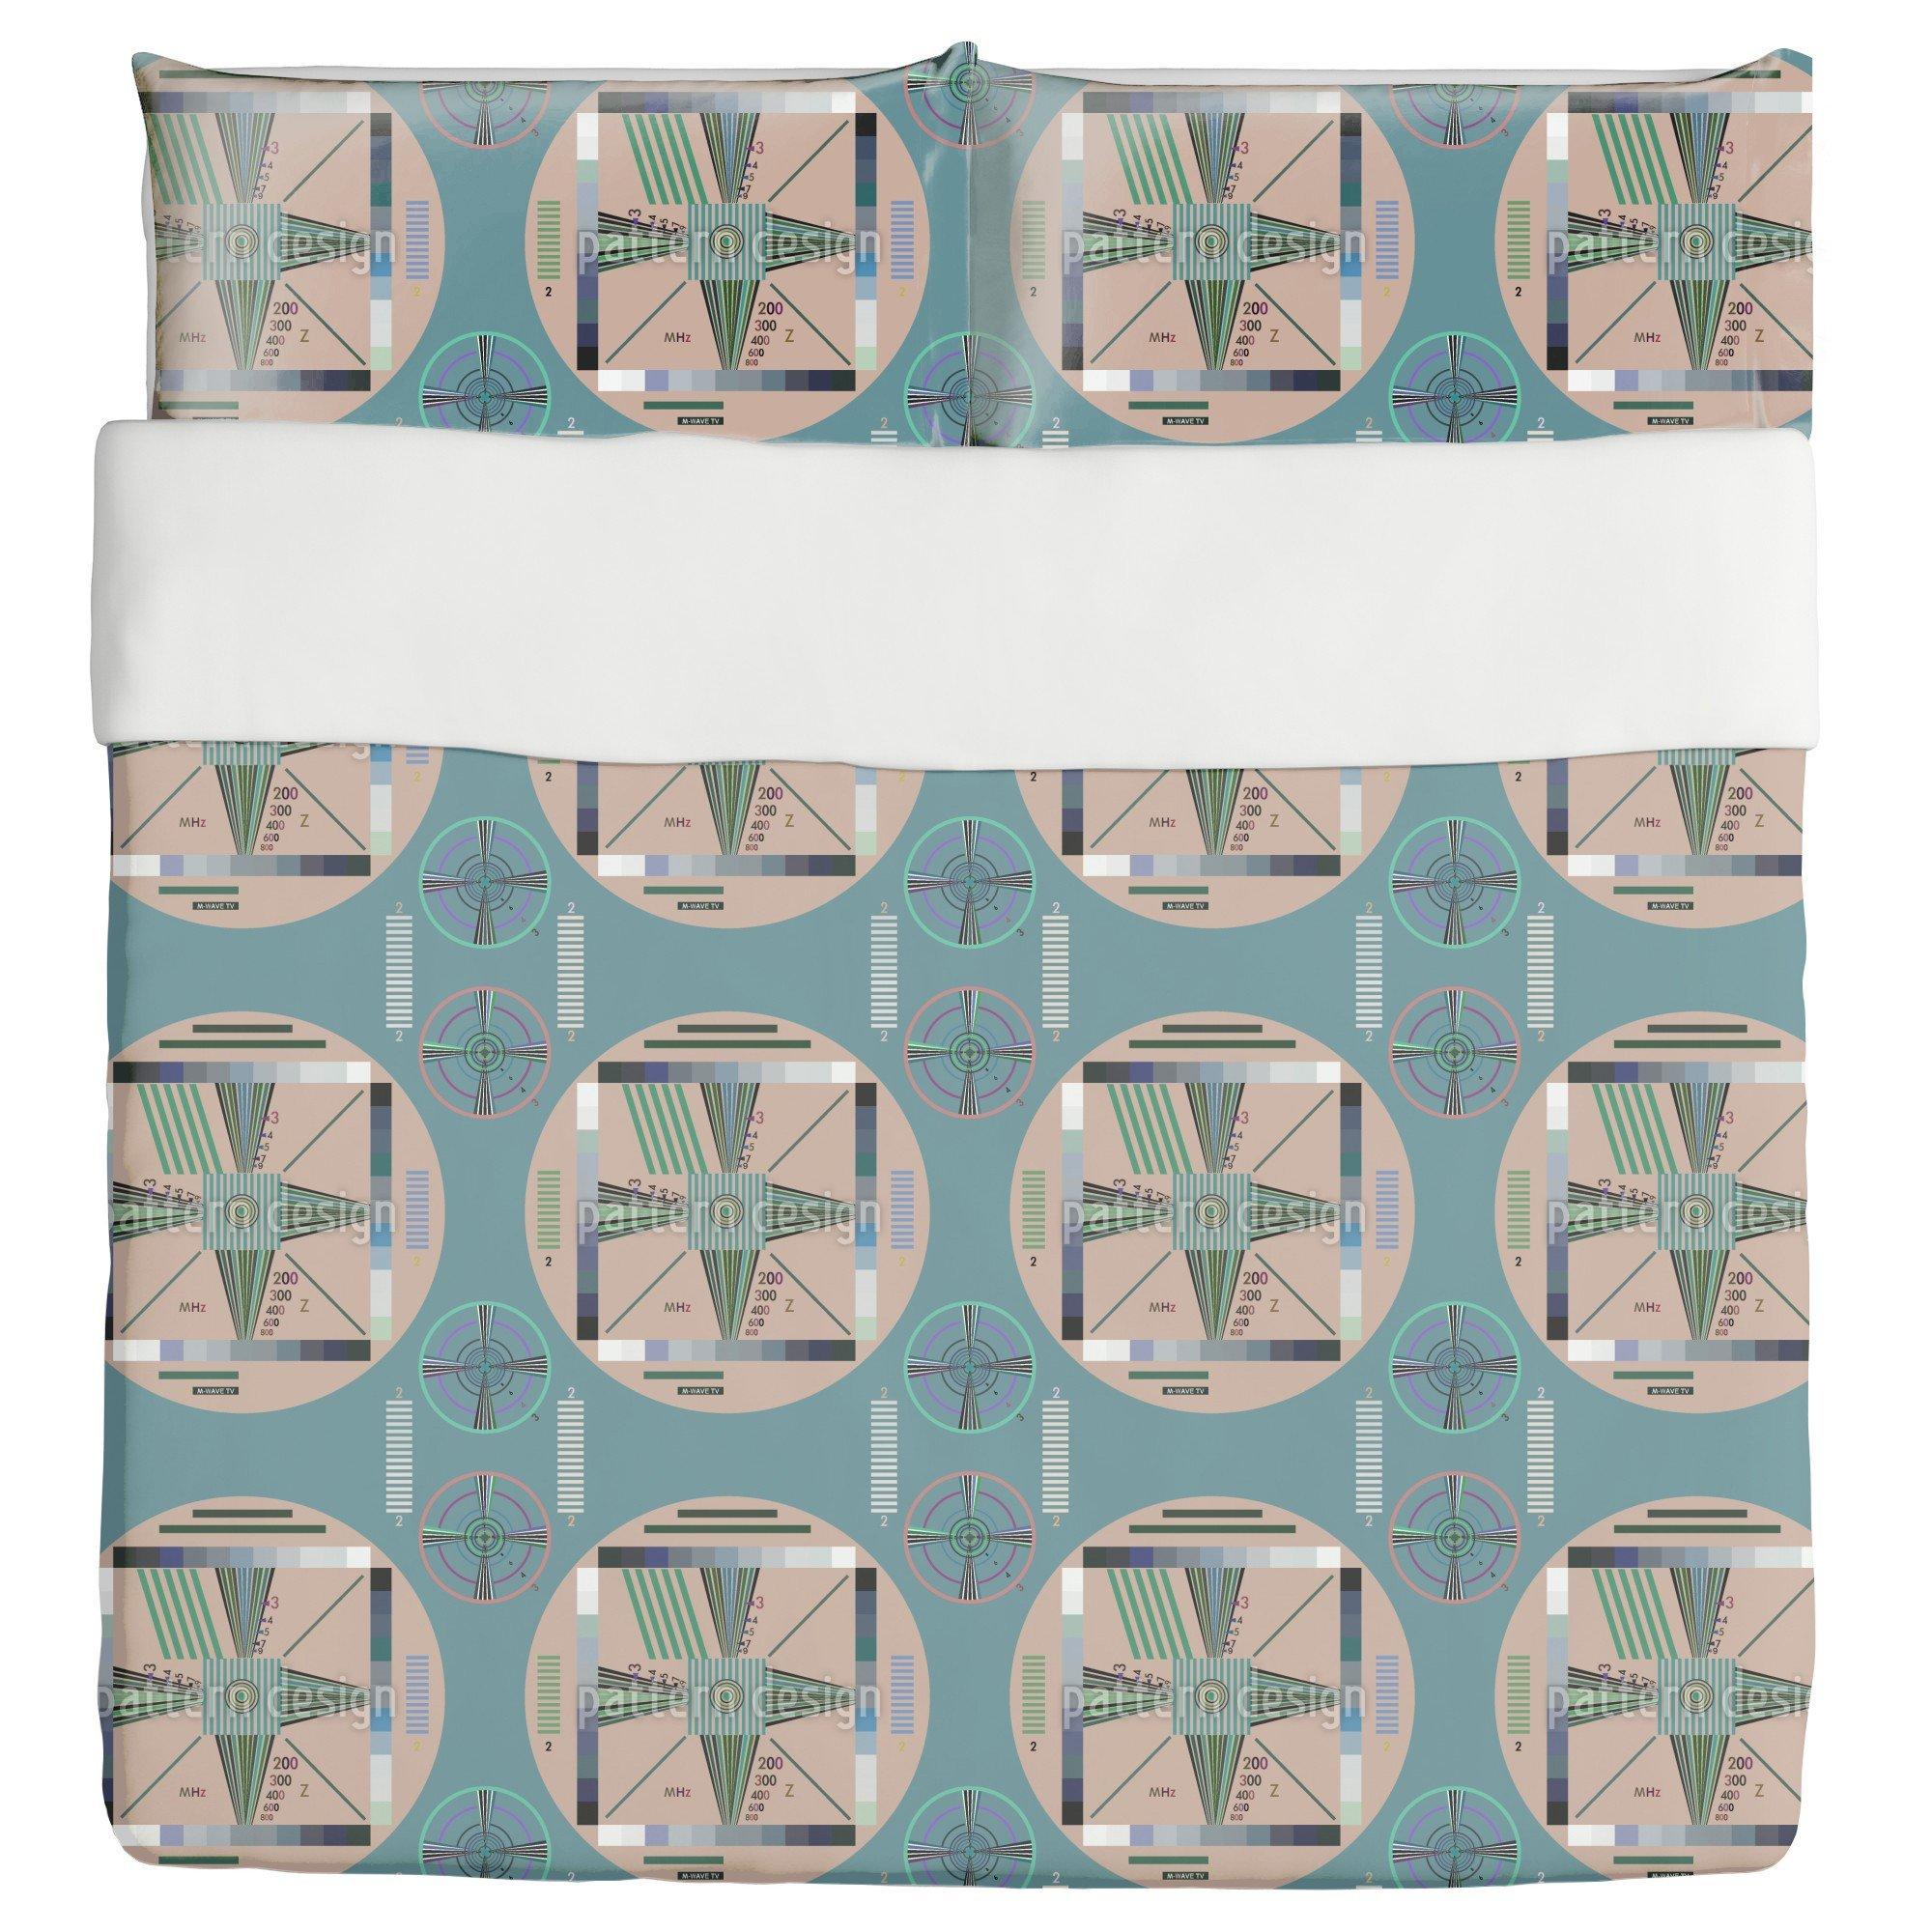 Stay Tuned Duvet Bed Set 3 Piece Set Duvet Cover - 2 Pillow Shams - Luxury Microfiber, Soft, Breathable